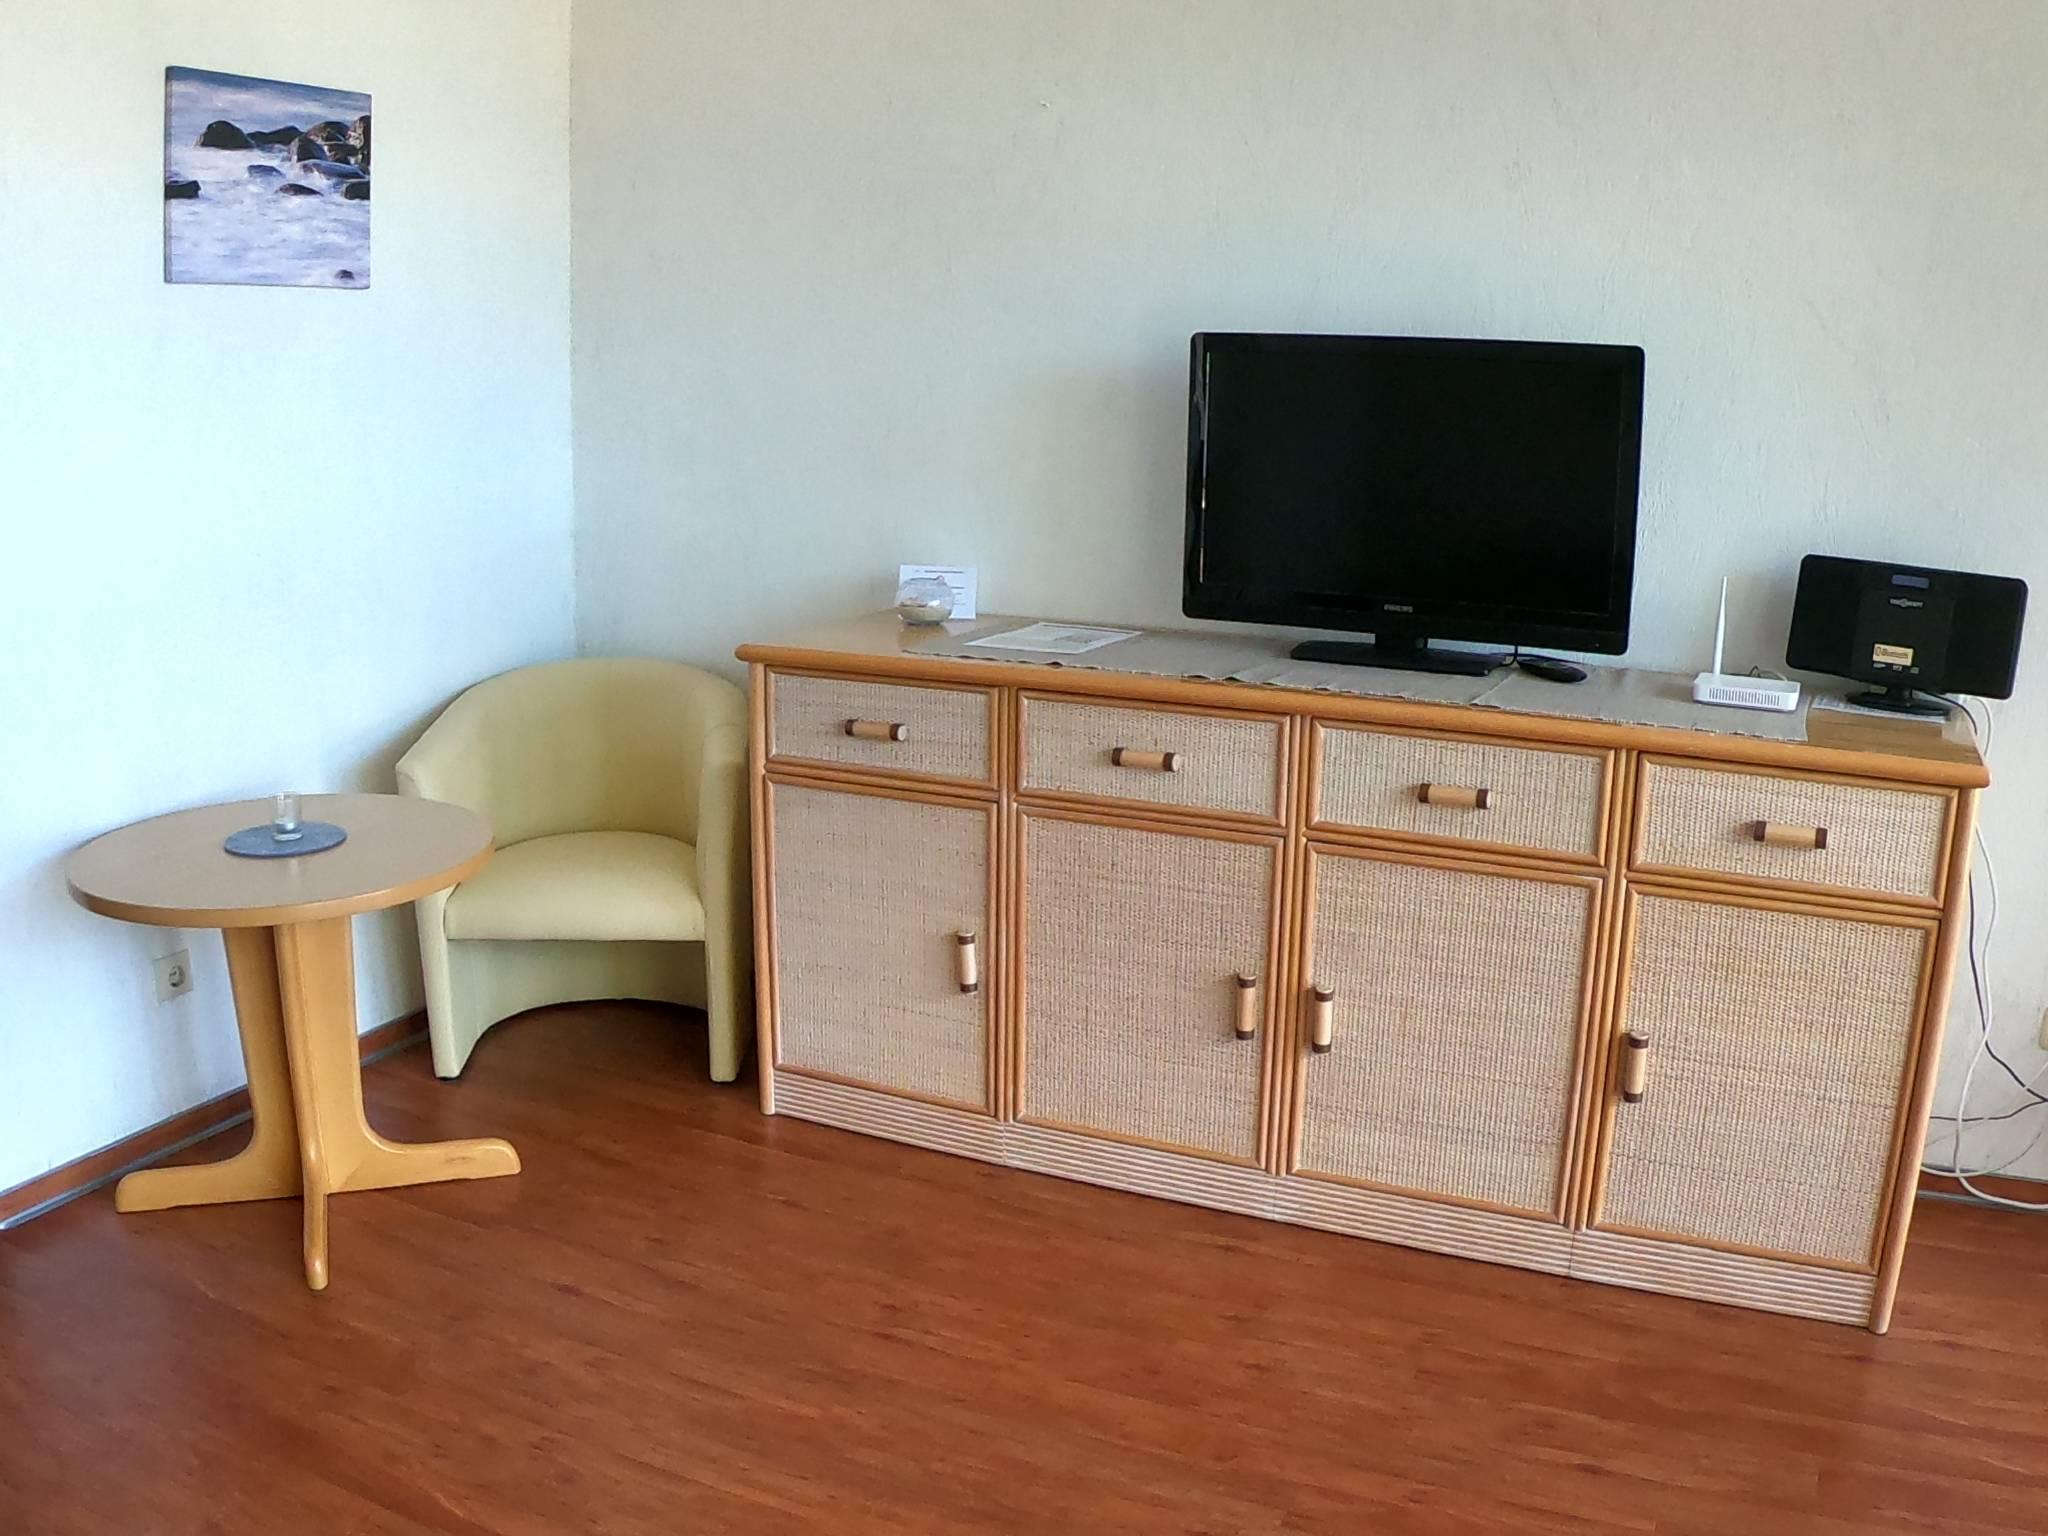 Wohnzimmer, Sideboard, TV, Stereo